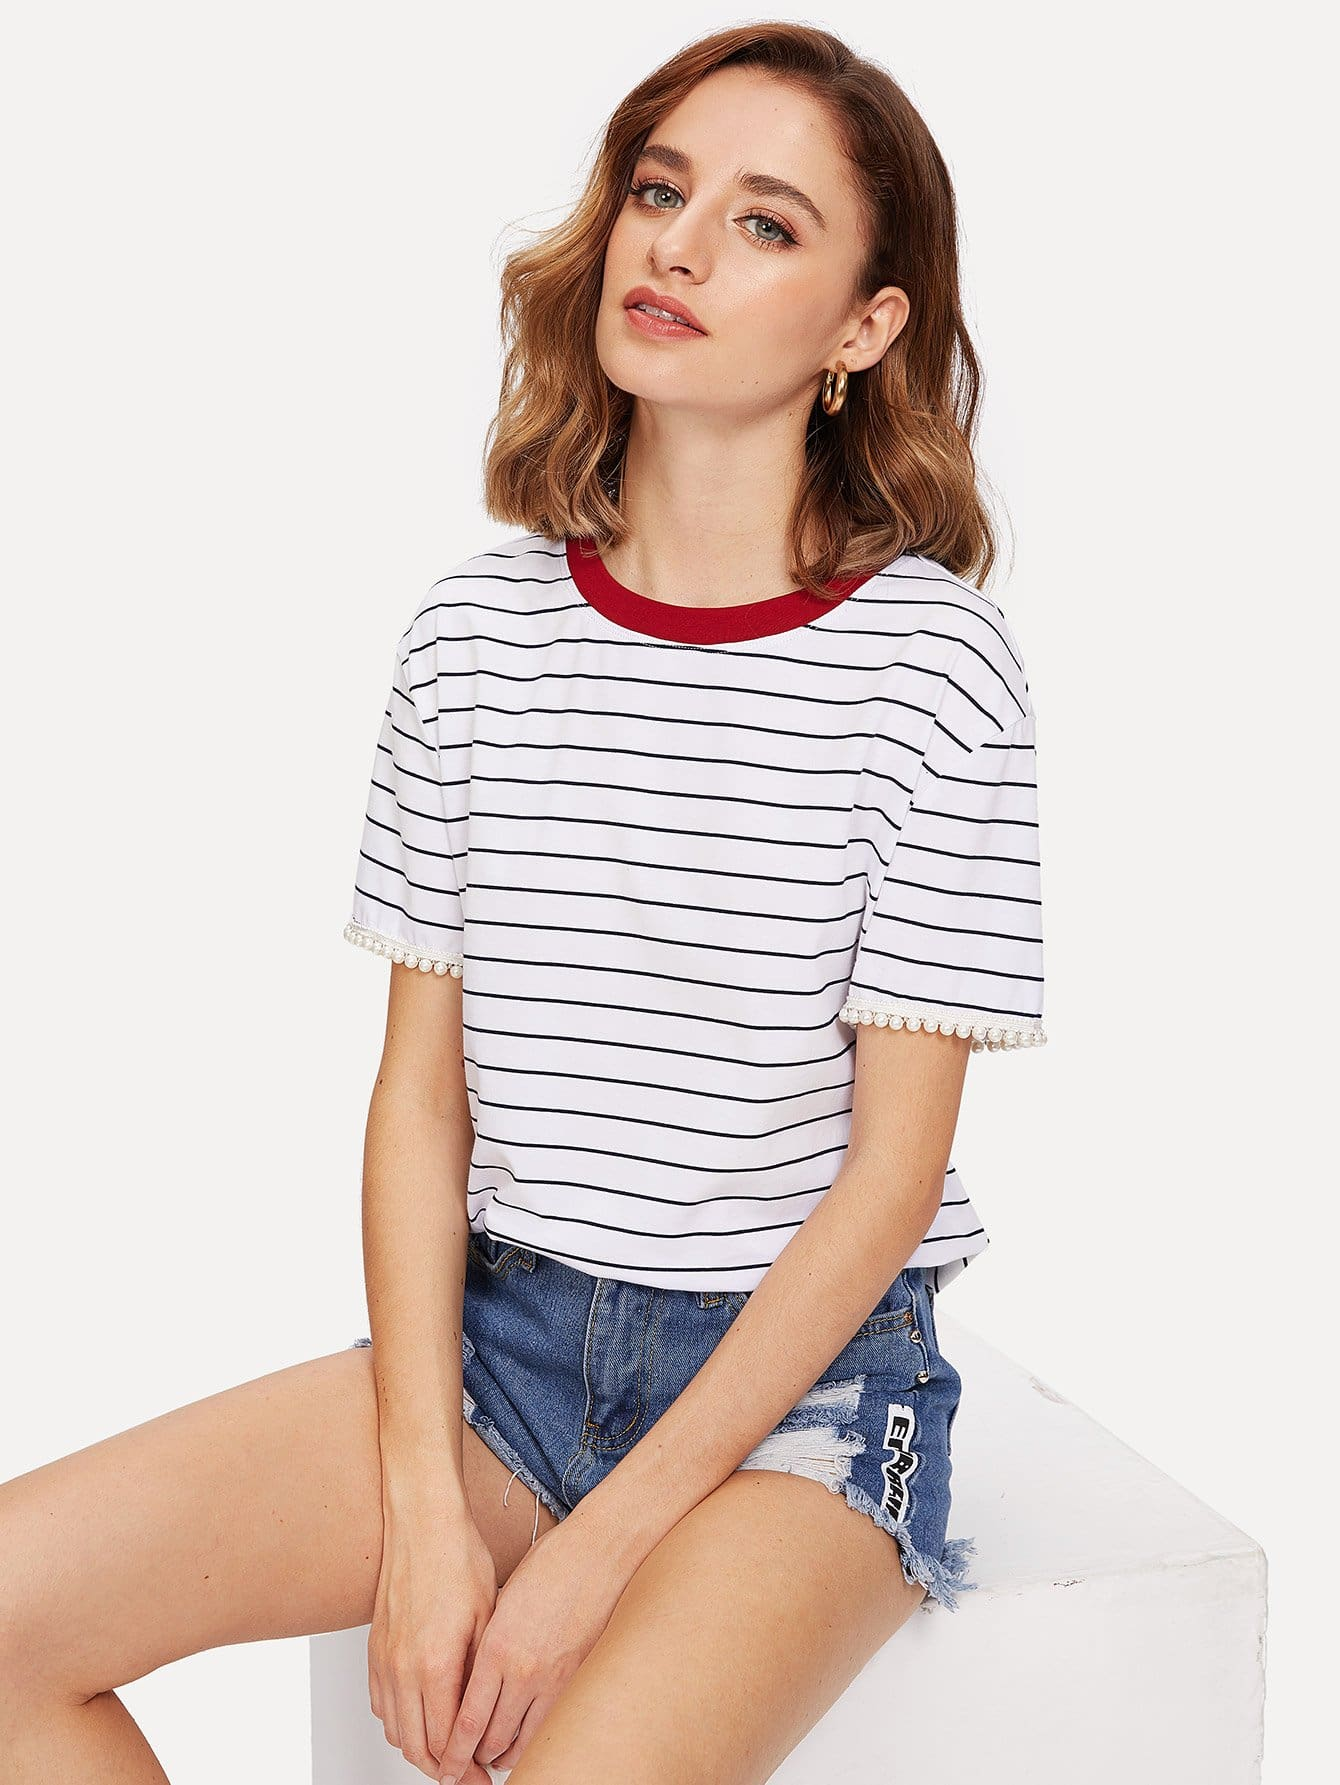 Contrast Neck Pearl Cuff Striped Tee contrast striped trim camo print tee